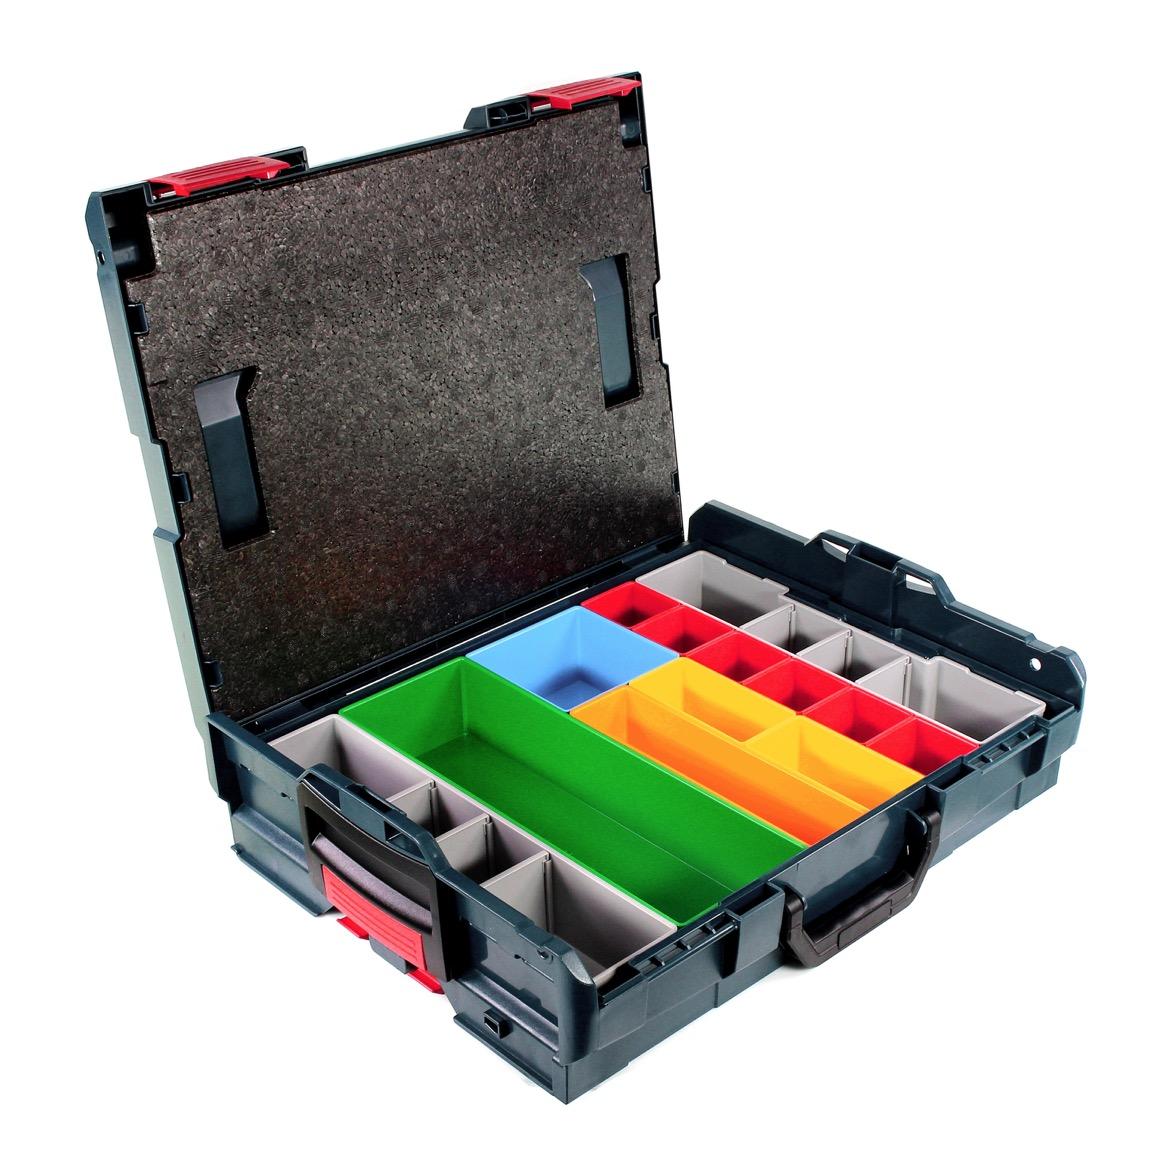 bosch l boxx sortimo box 102 system werkzeugkoffer gr e 1. Black Bedroom Furniture Sets. Home Design Ideas